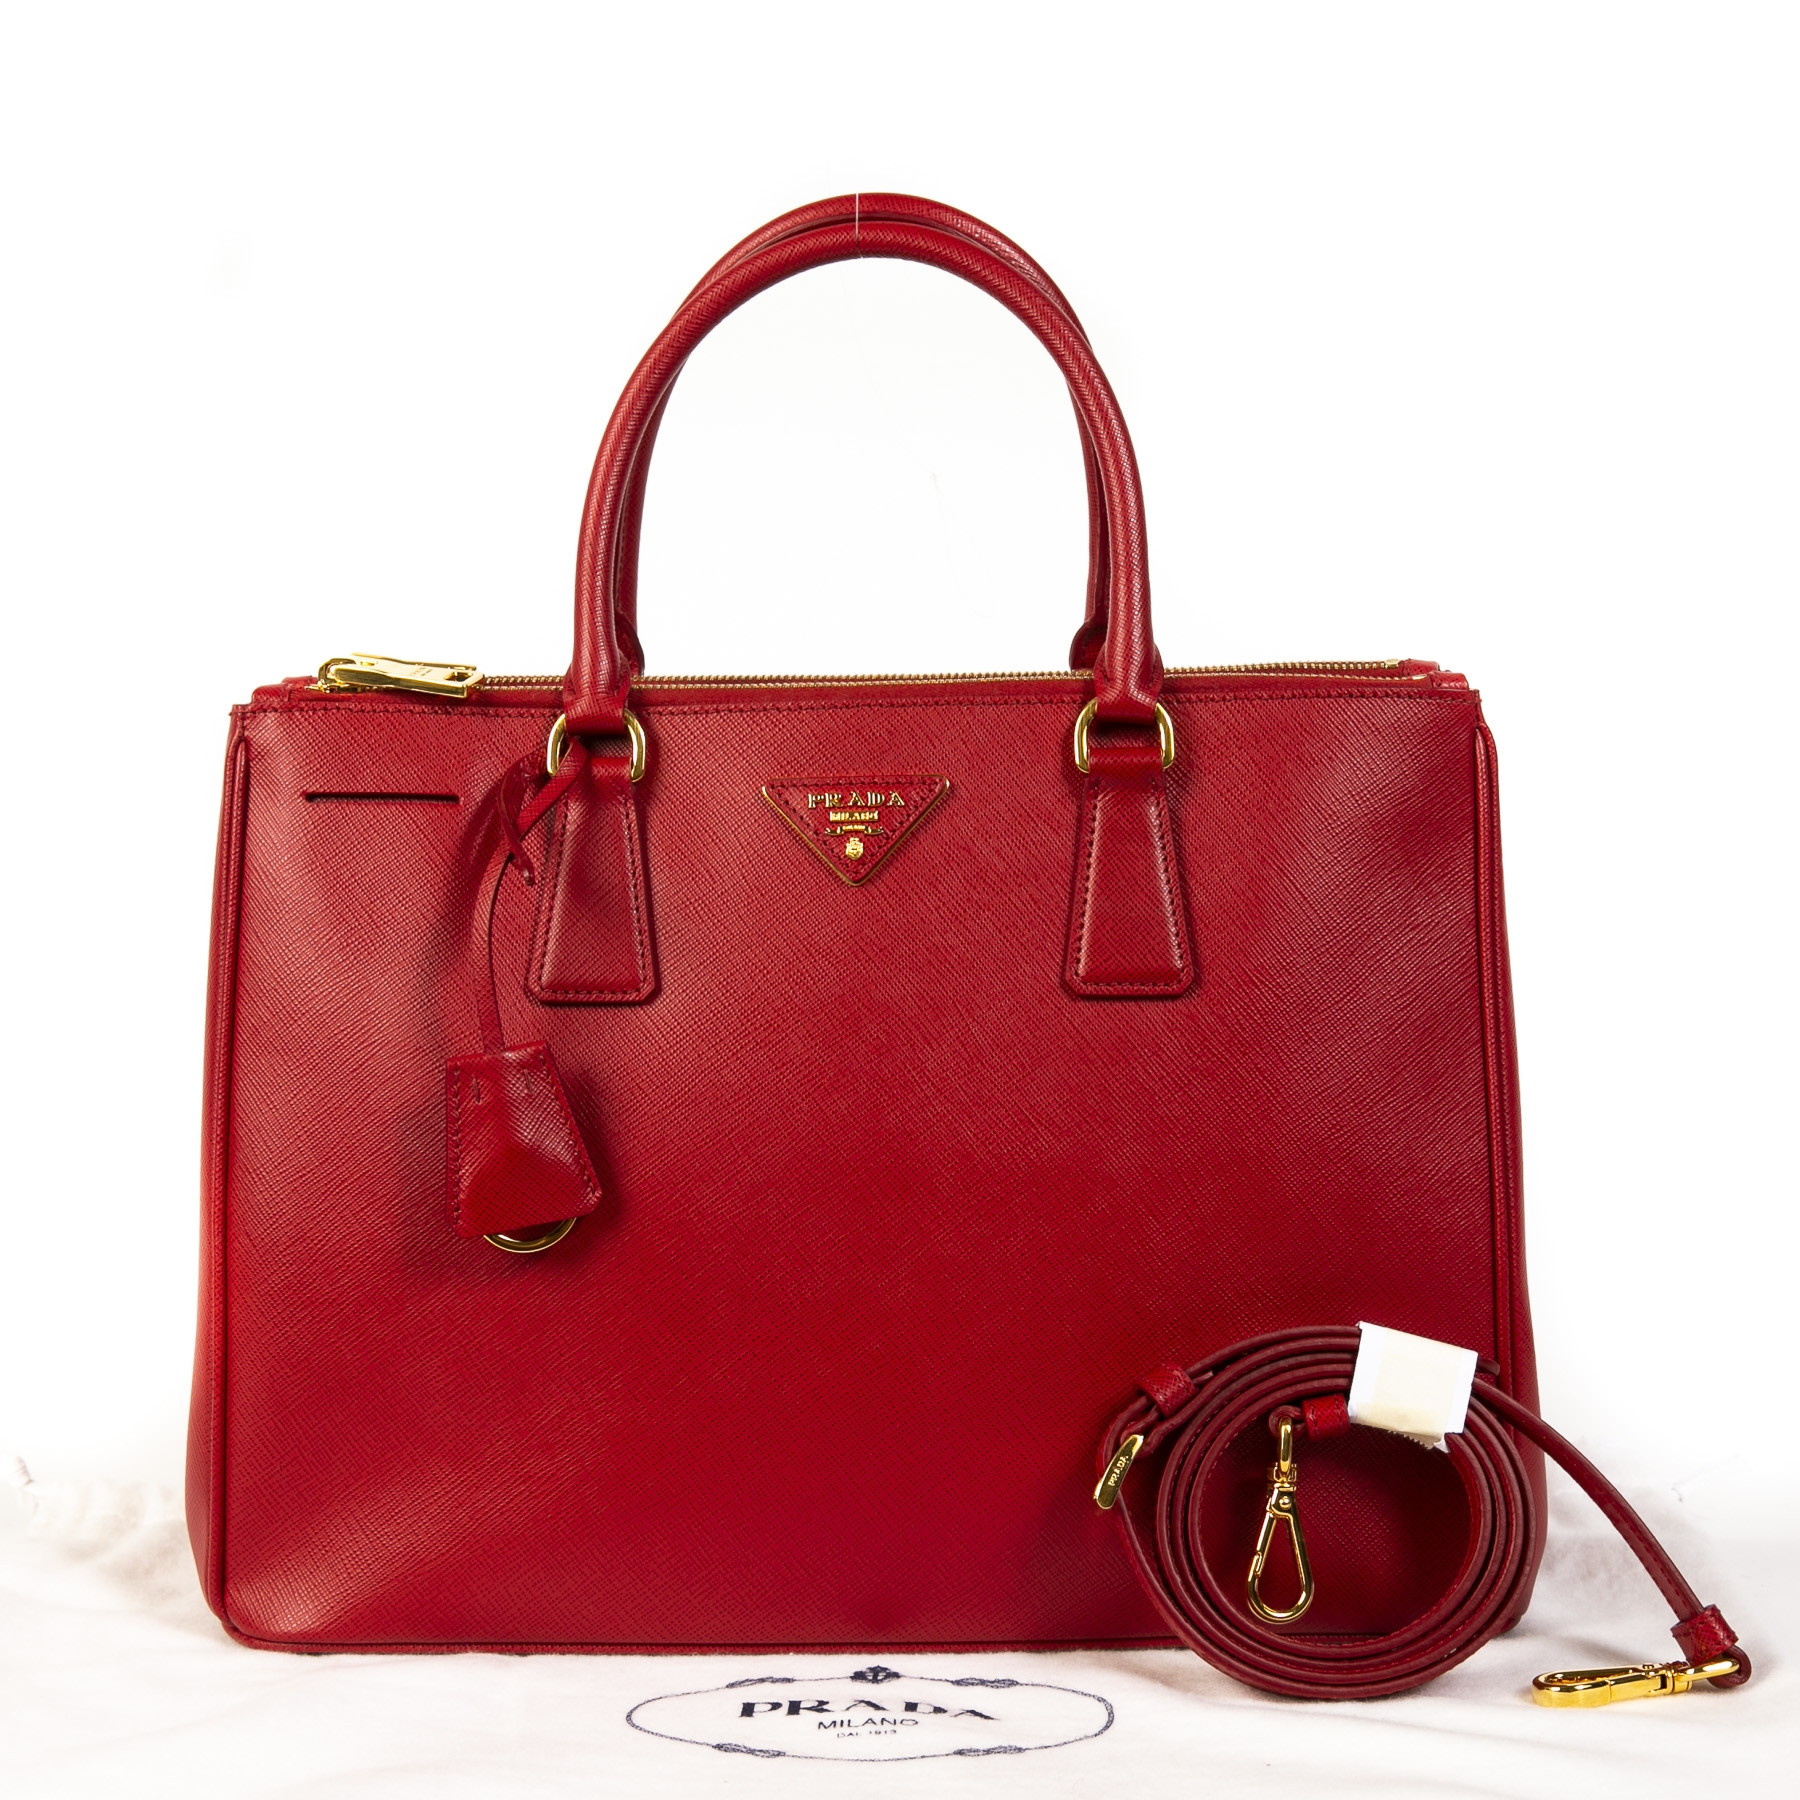 7435d788df6 Labellov Shop Authentic Vintage Luxury Designer Handbags Online ...